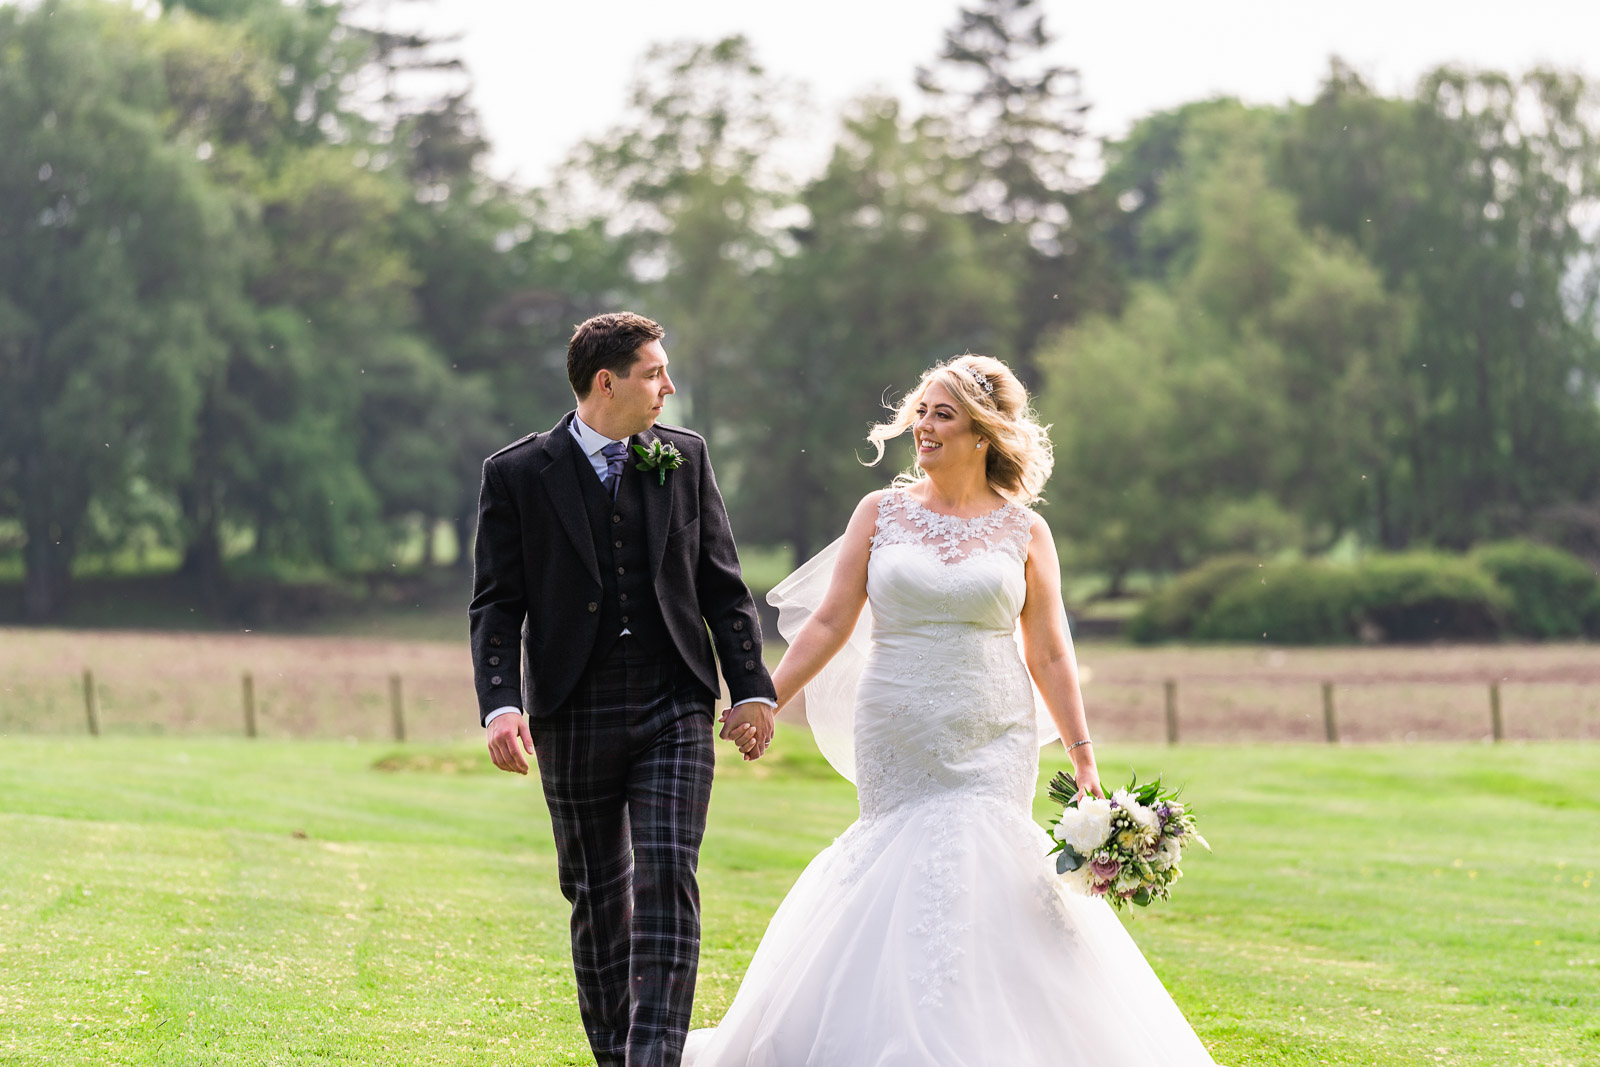 cornhill_castle_wedding_biggar_dearlyphotography (214 of 448).jpg